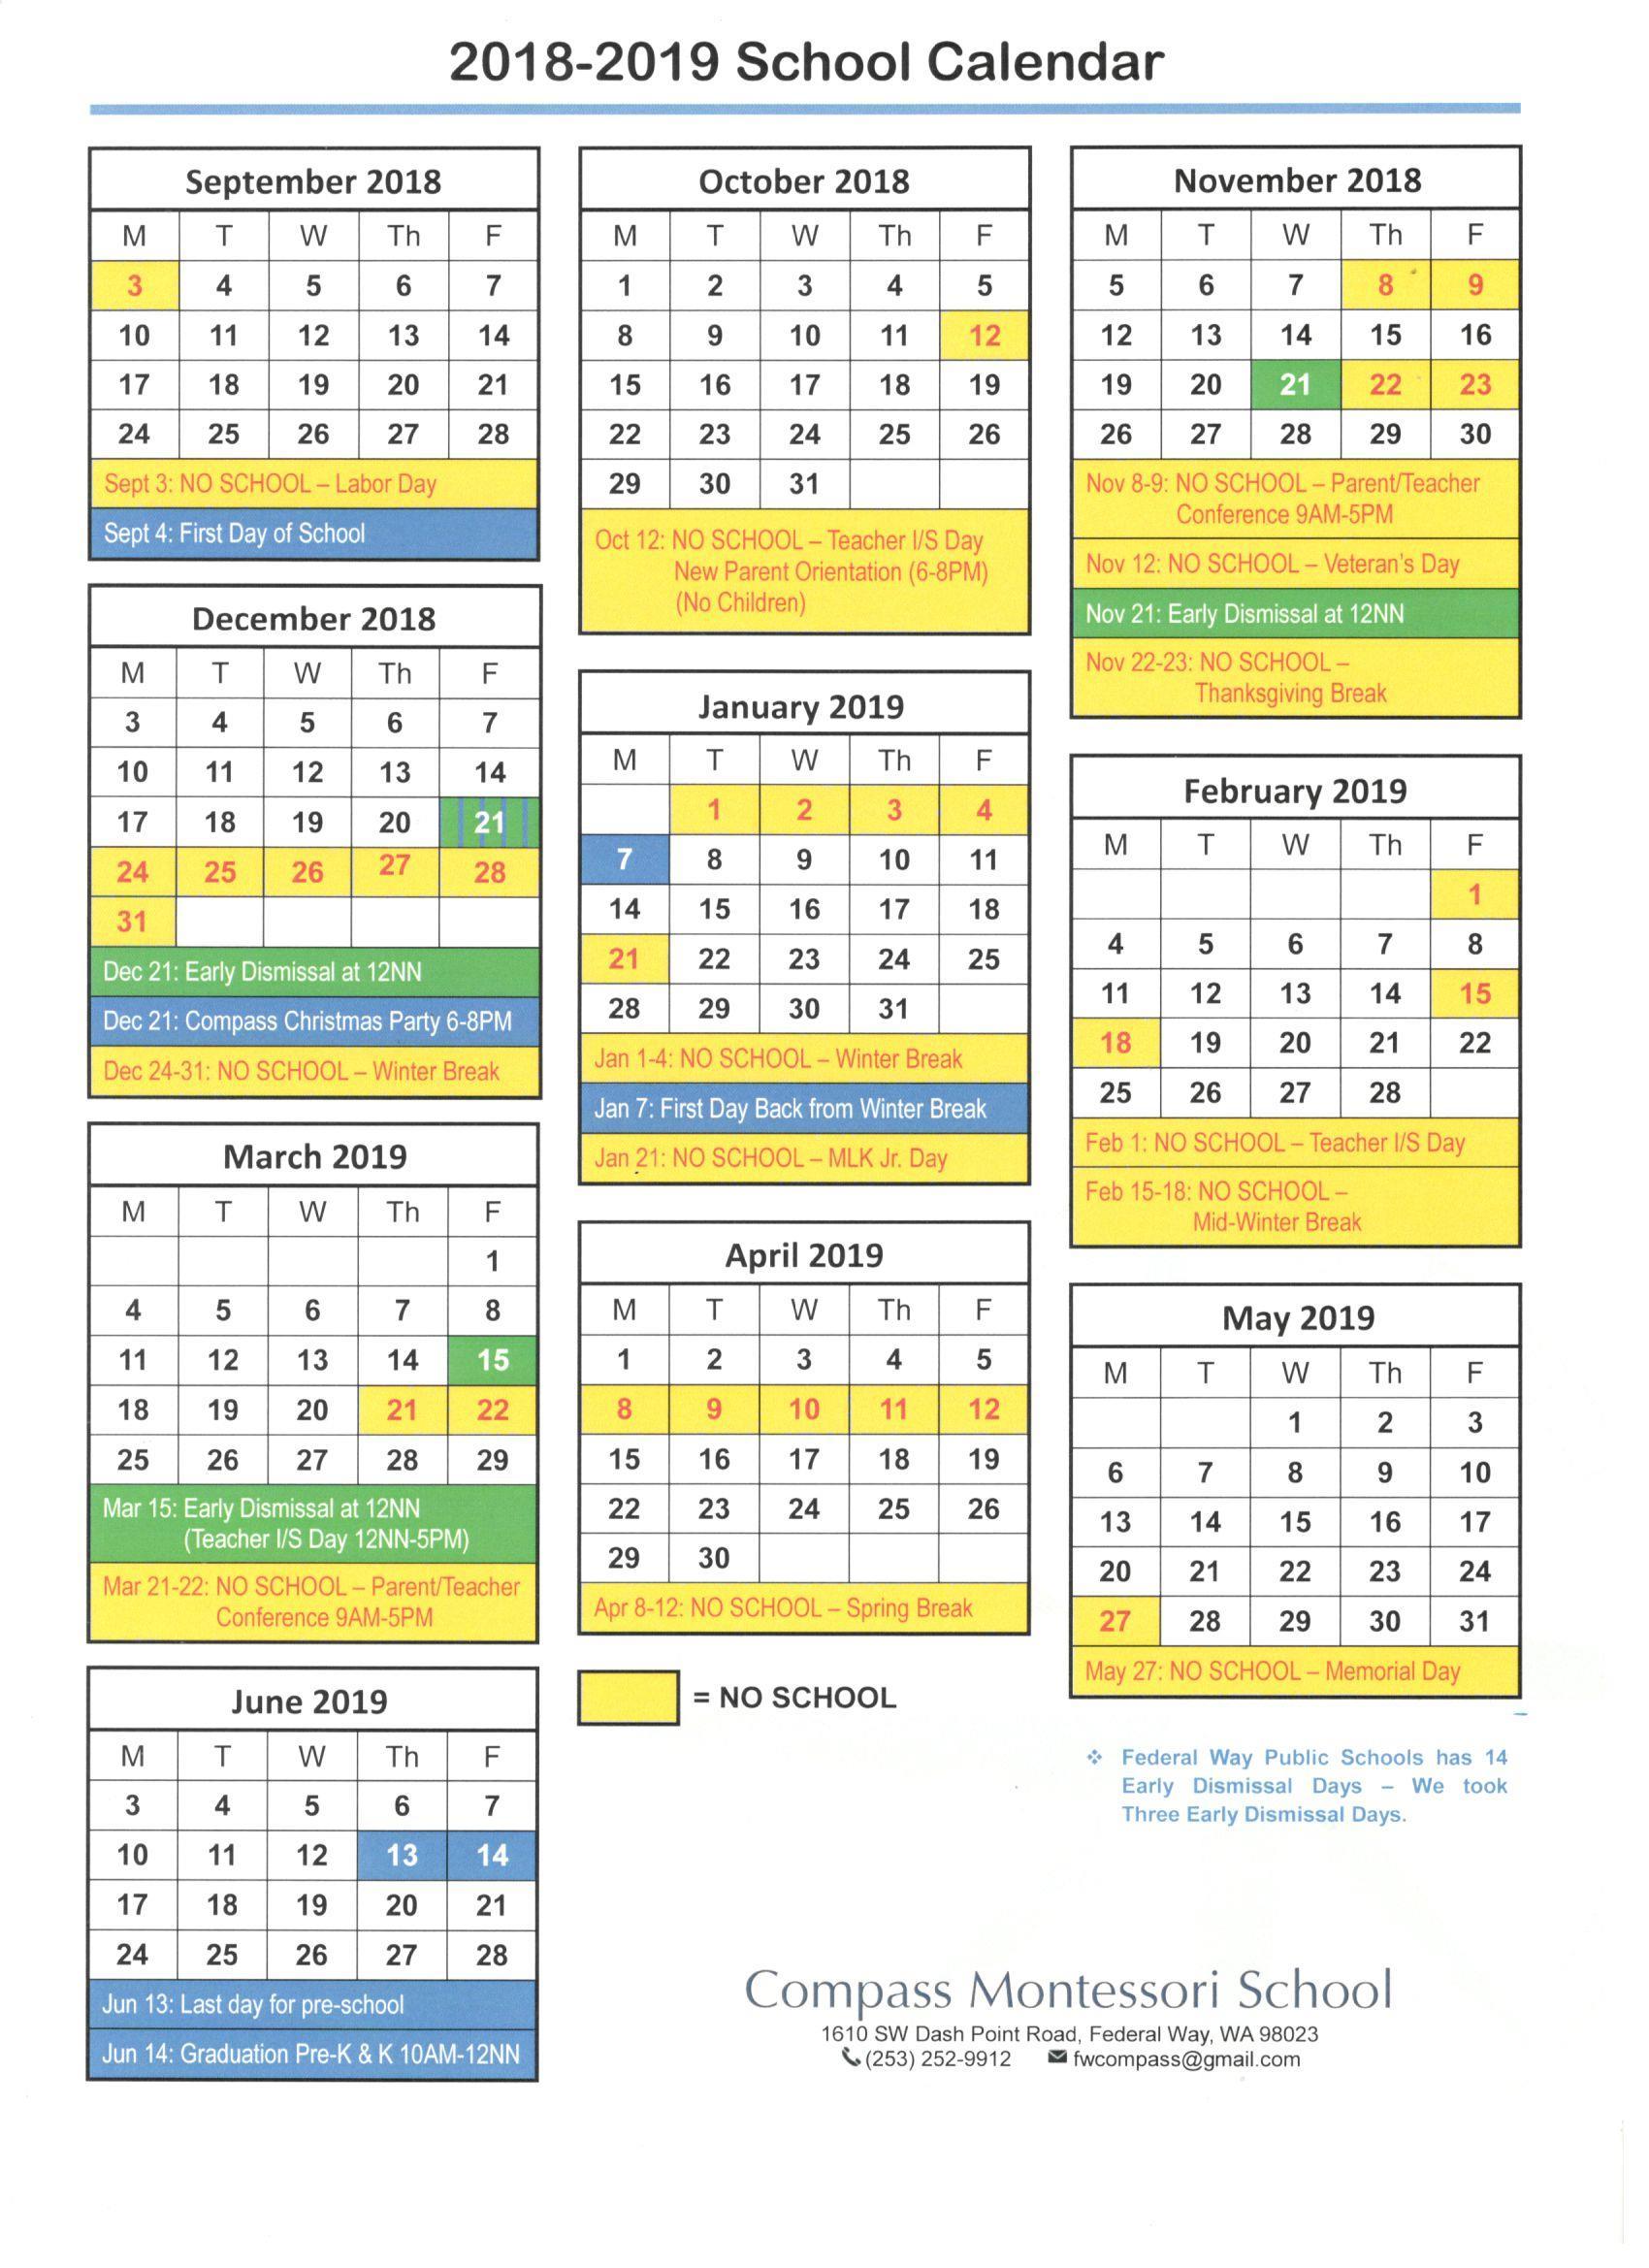 2018 2019 School Calendar Compass Montessori School Of Federal Way